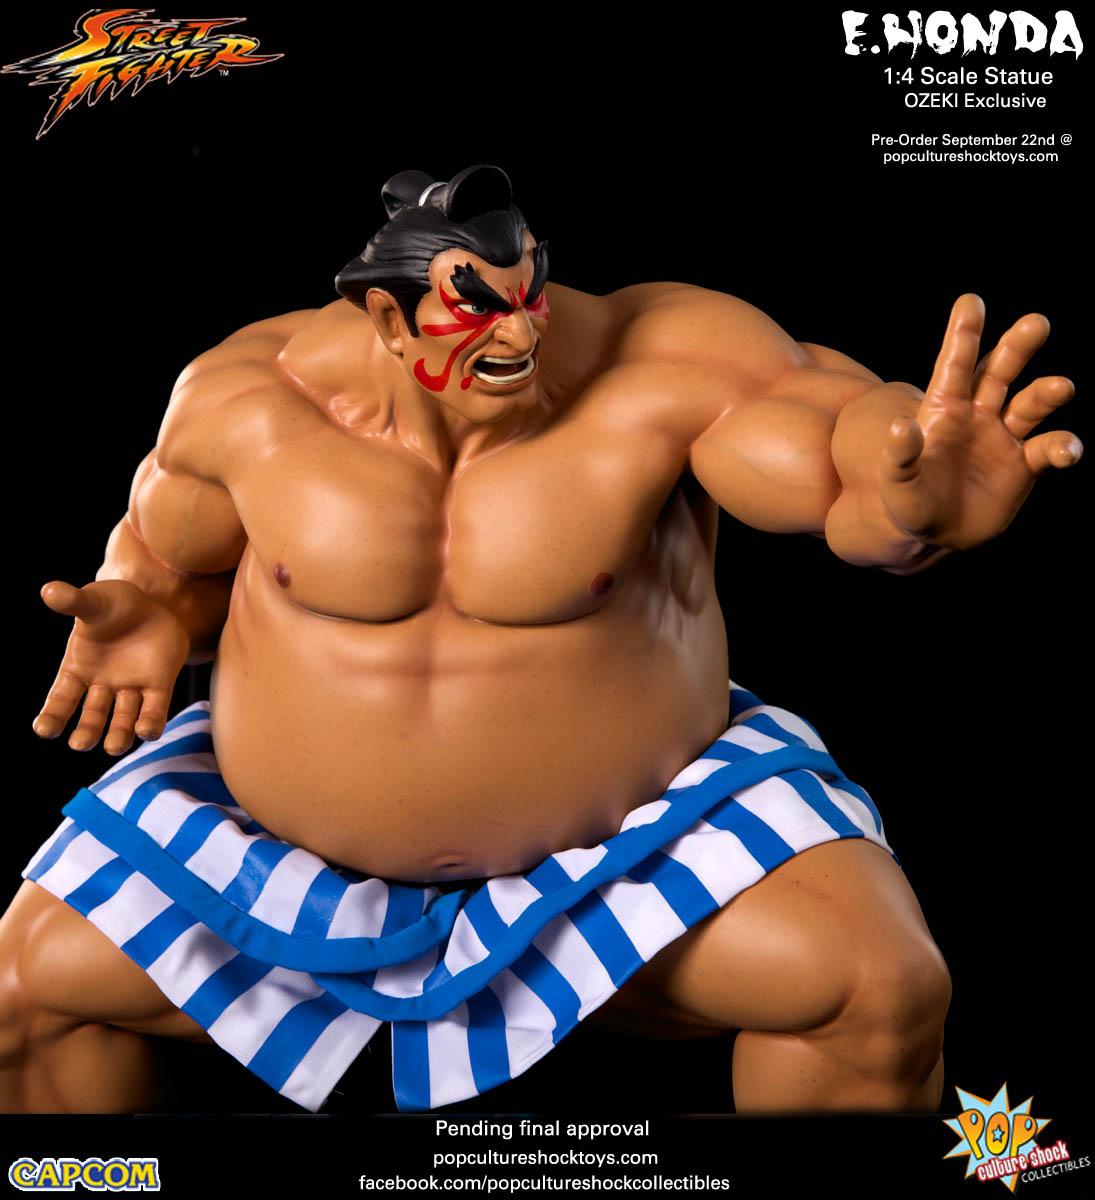 [Pop Culture Shock] Street Fighter: E. Honda 1/4 Statue - Página 3 Street-Fighter-E.-Honda-ozeki-Statue-013